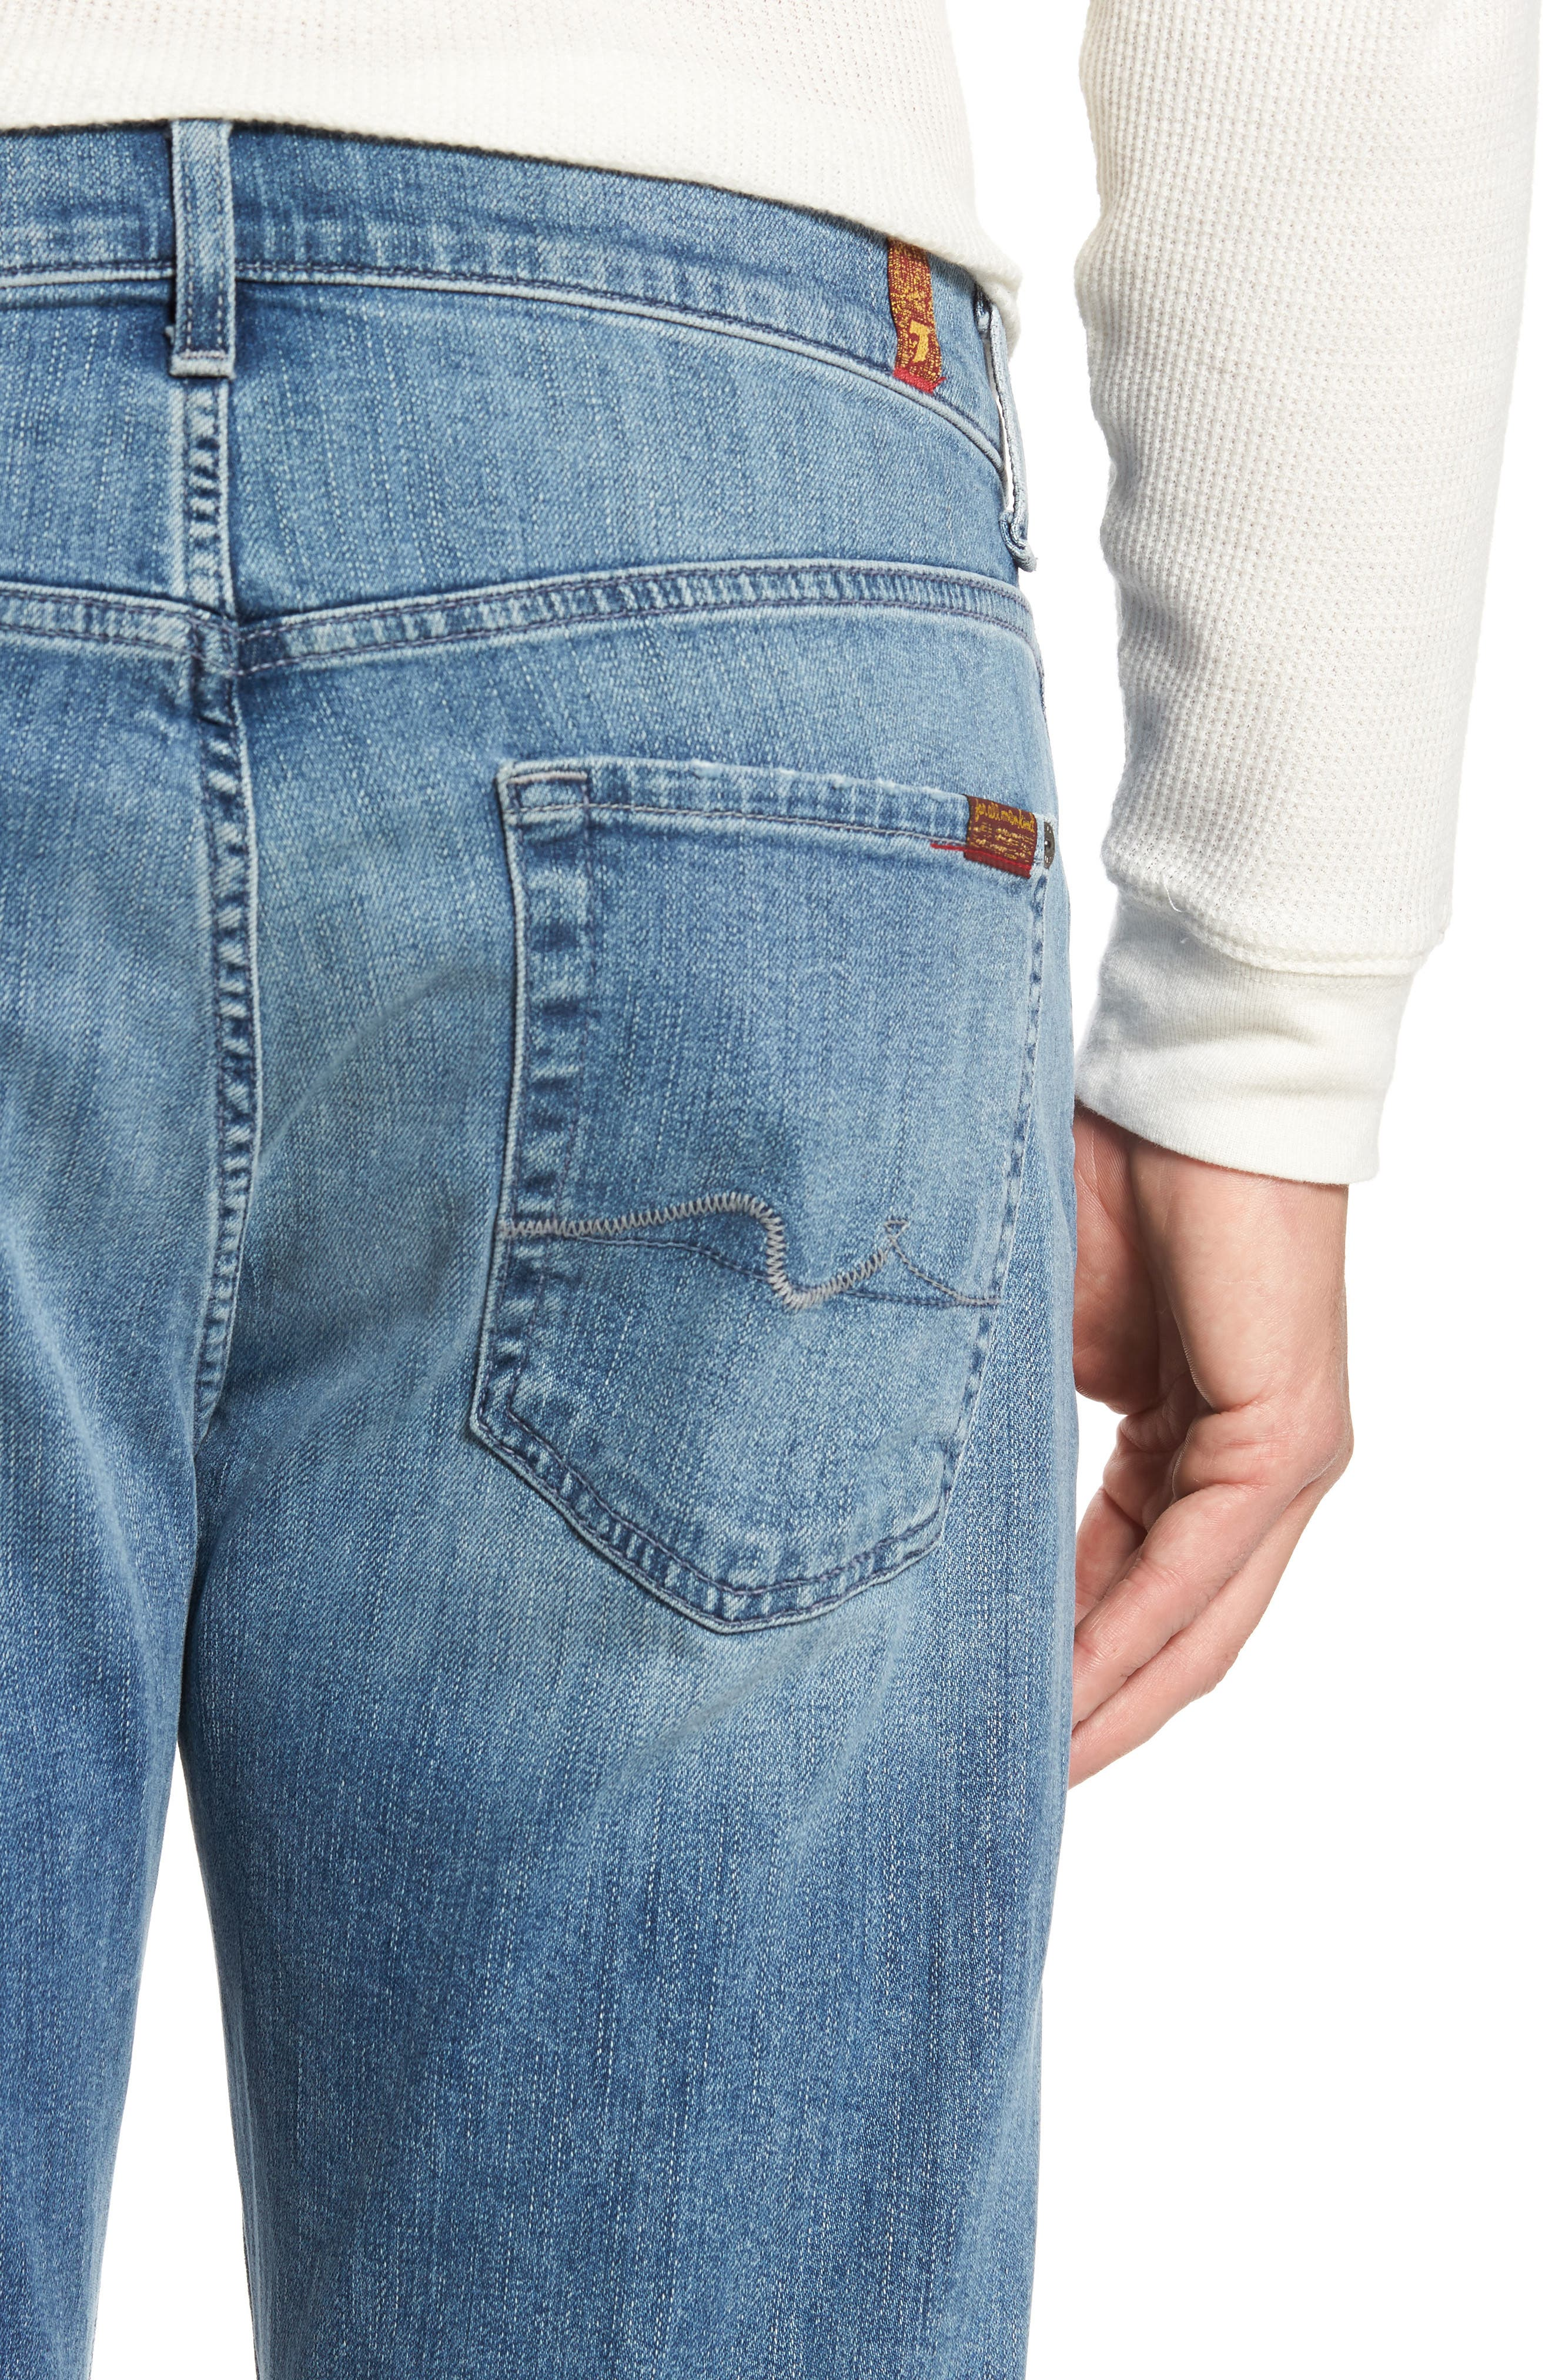 Luxe Performance - Carsen Straight Leg Jeans,                             Alternate thumbnail 4, color,                             Homage